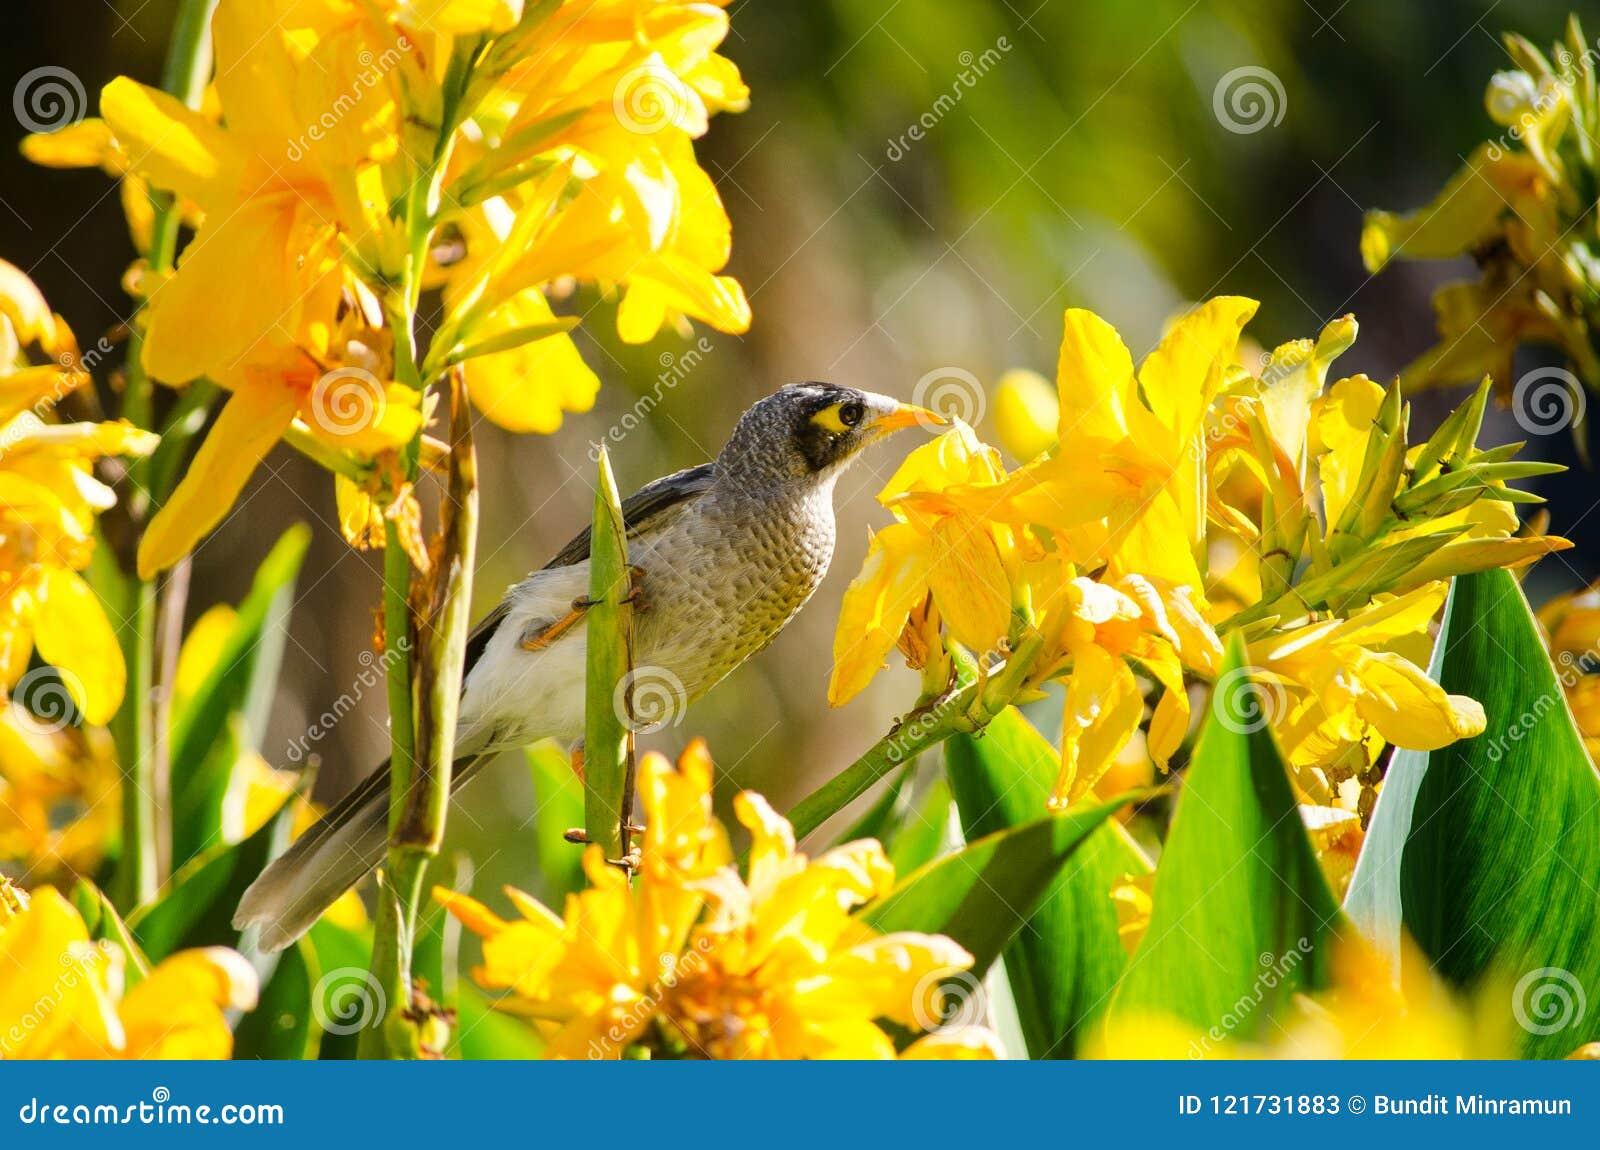 Cute Noisy Miner Bird Feeding On Yellow Canna Flower In Spring